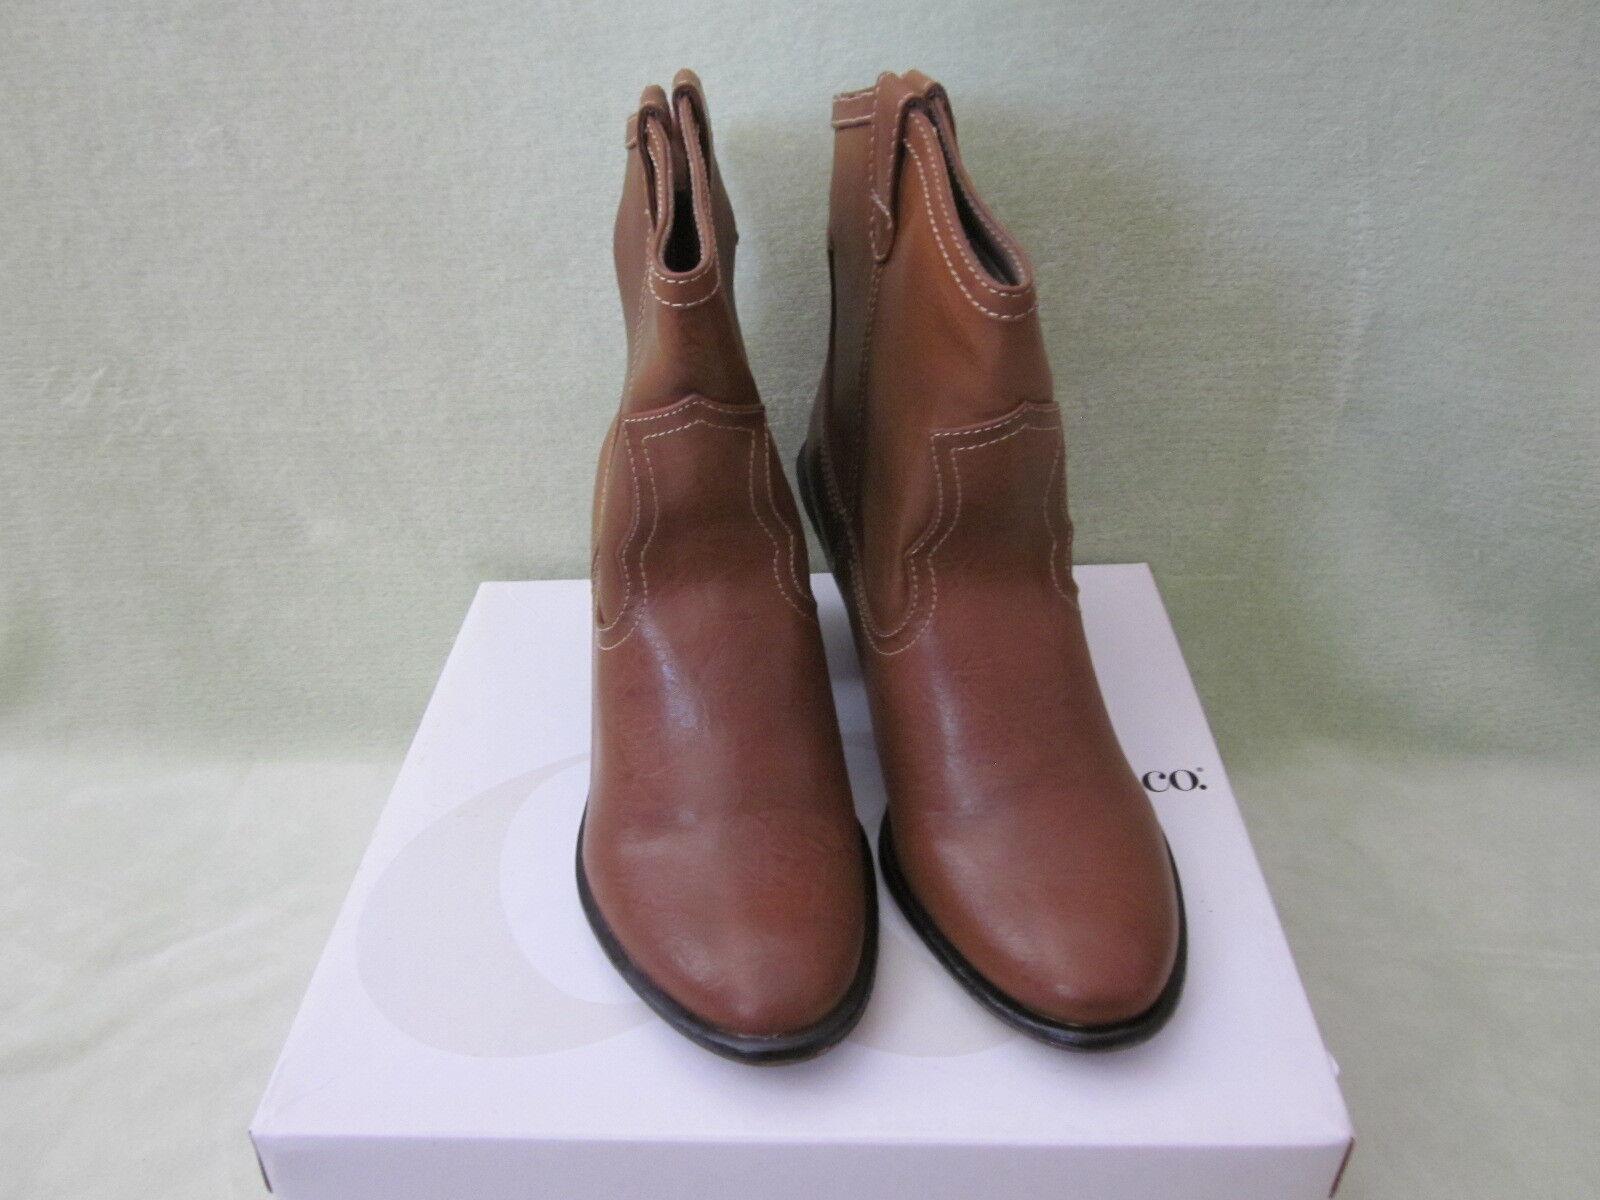 Style&Co Blaise Braun Made Western 9.5 Stiefel Man Made Braun NIB Super CUTE 71f69a